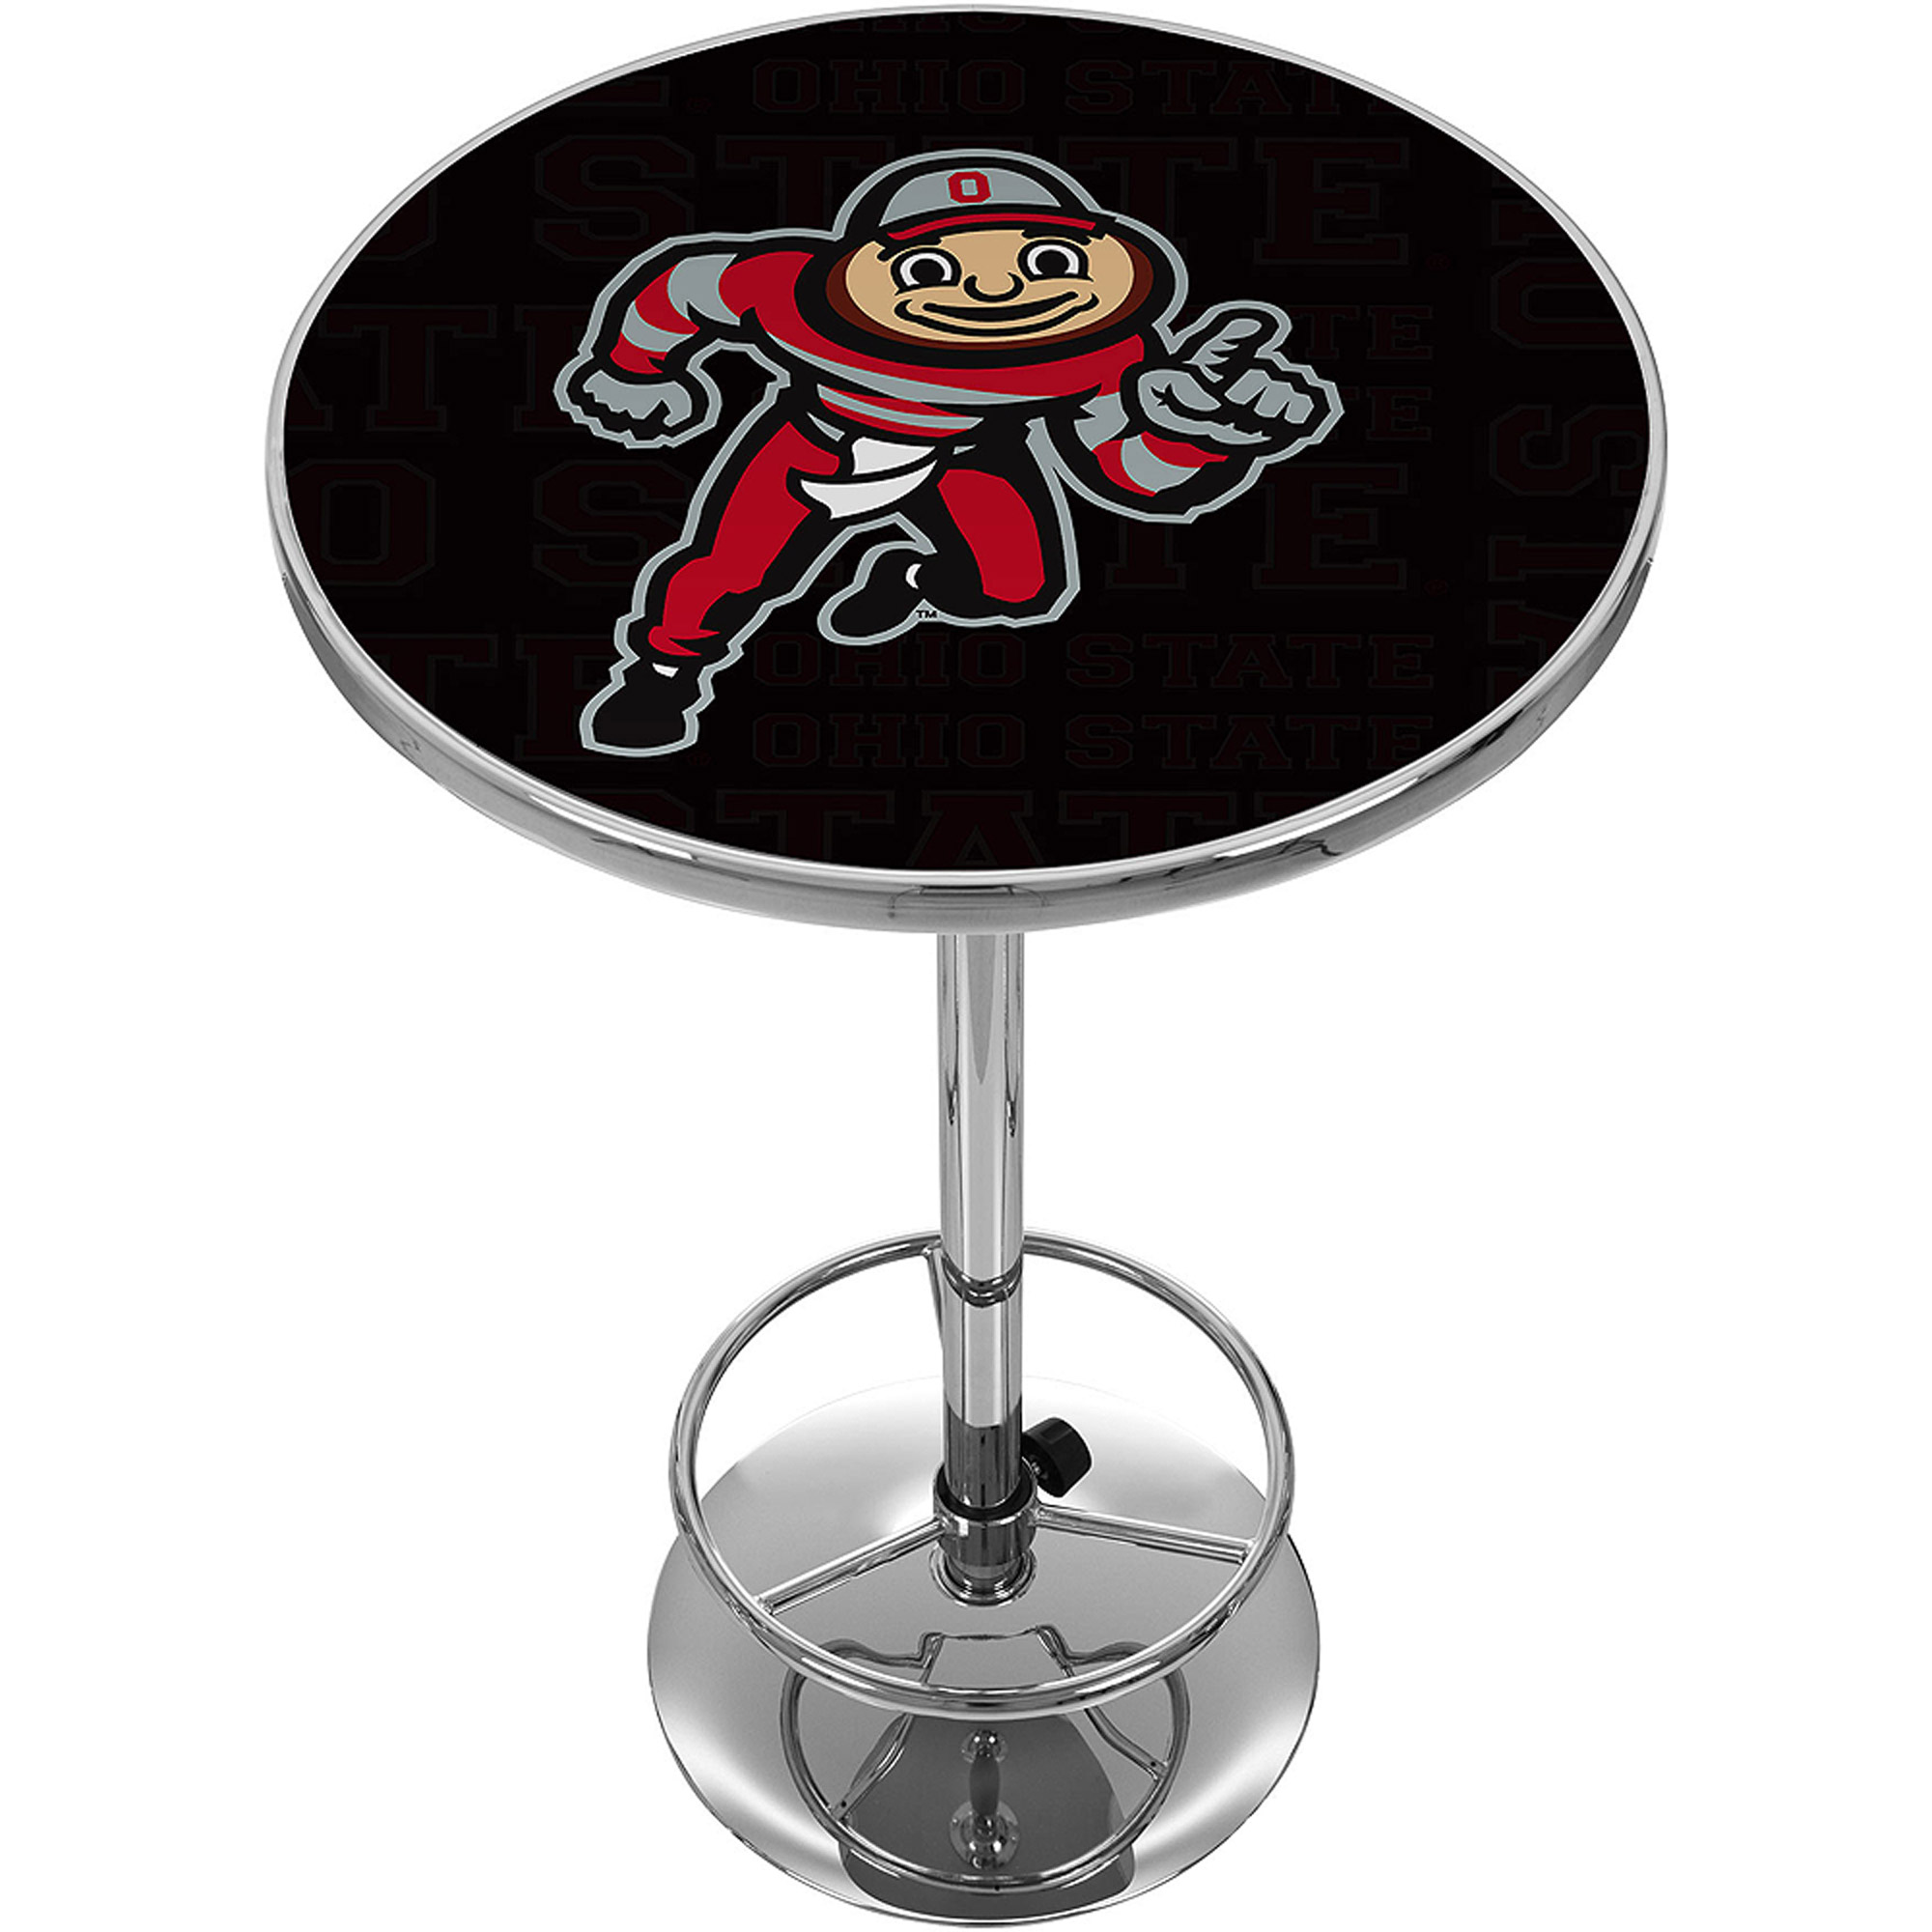 Ohio State Brutus Dash Chrome Pub Table